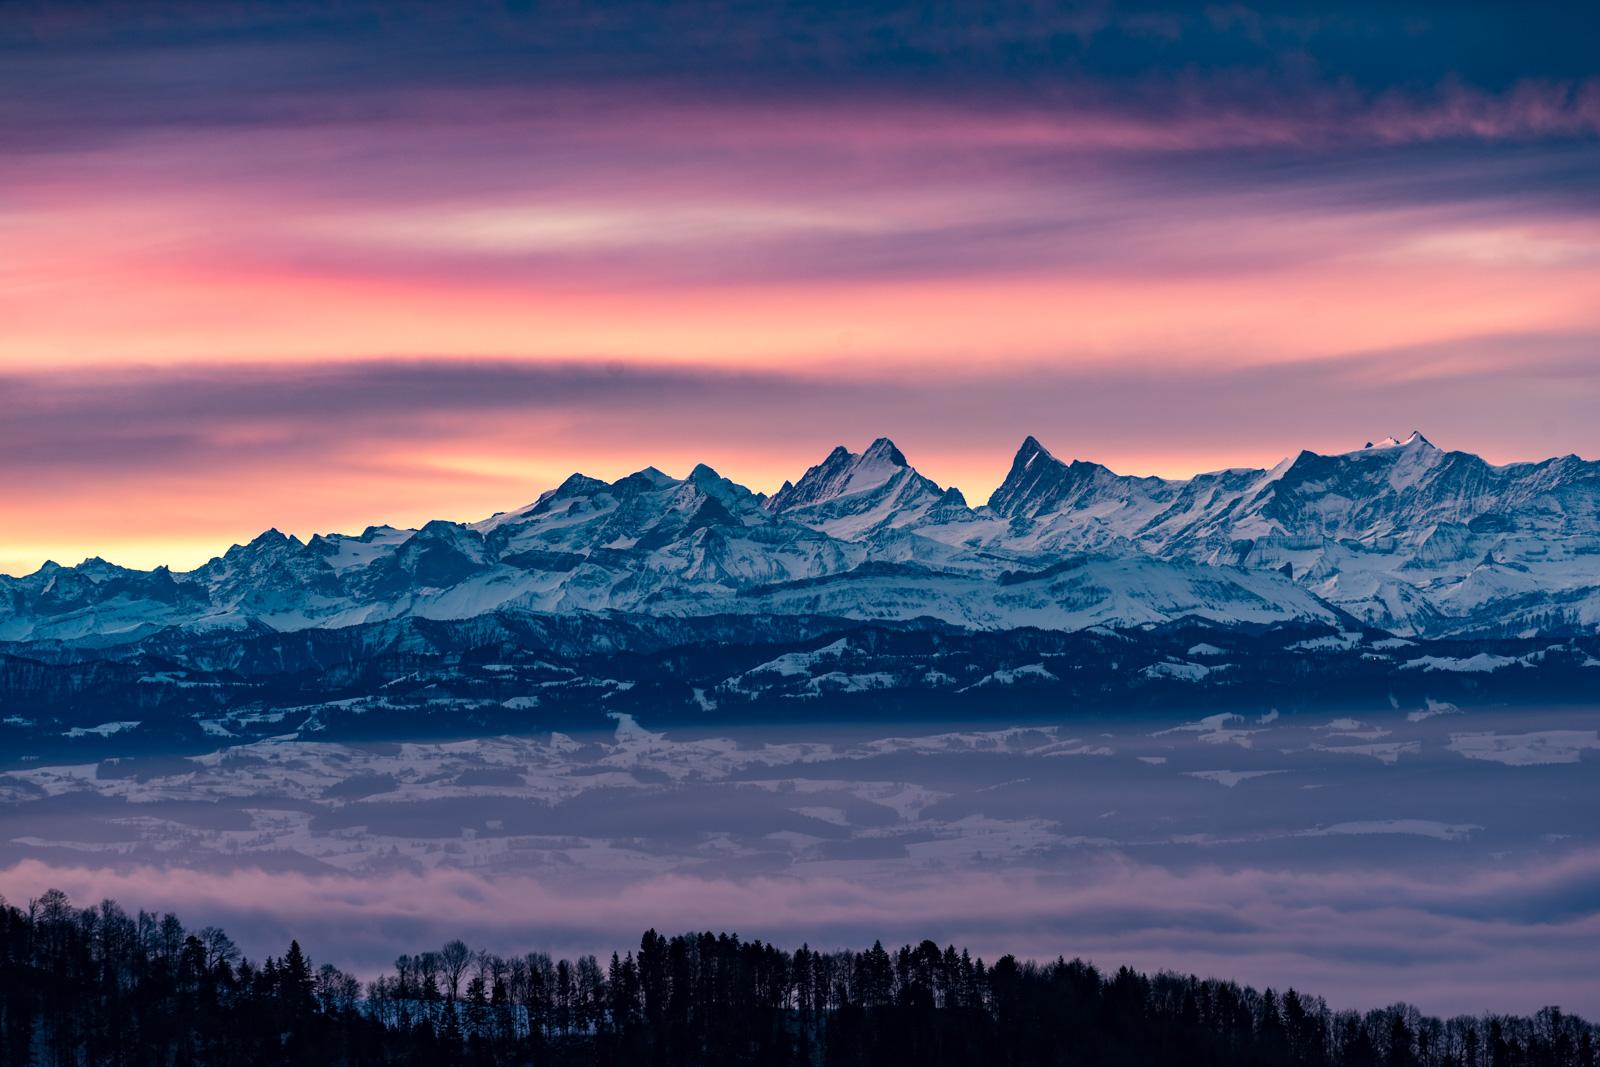 Vogelberg / Passwang, Switzerland